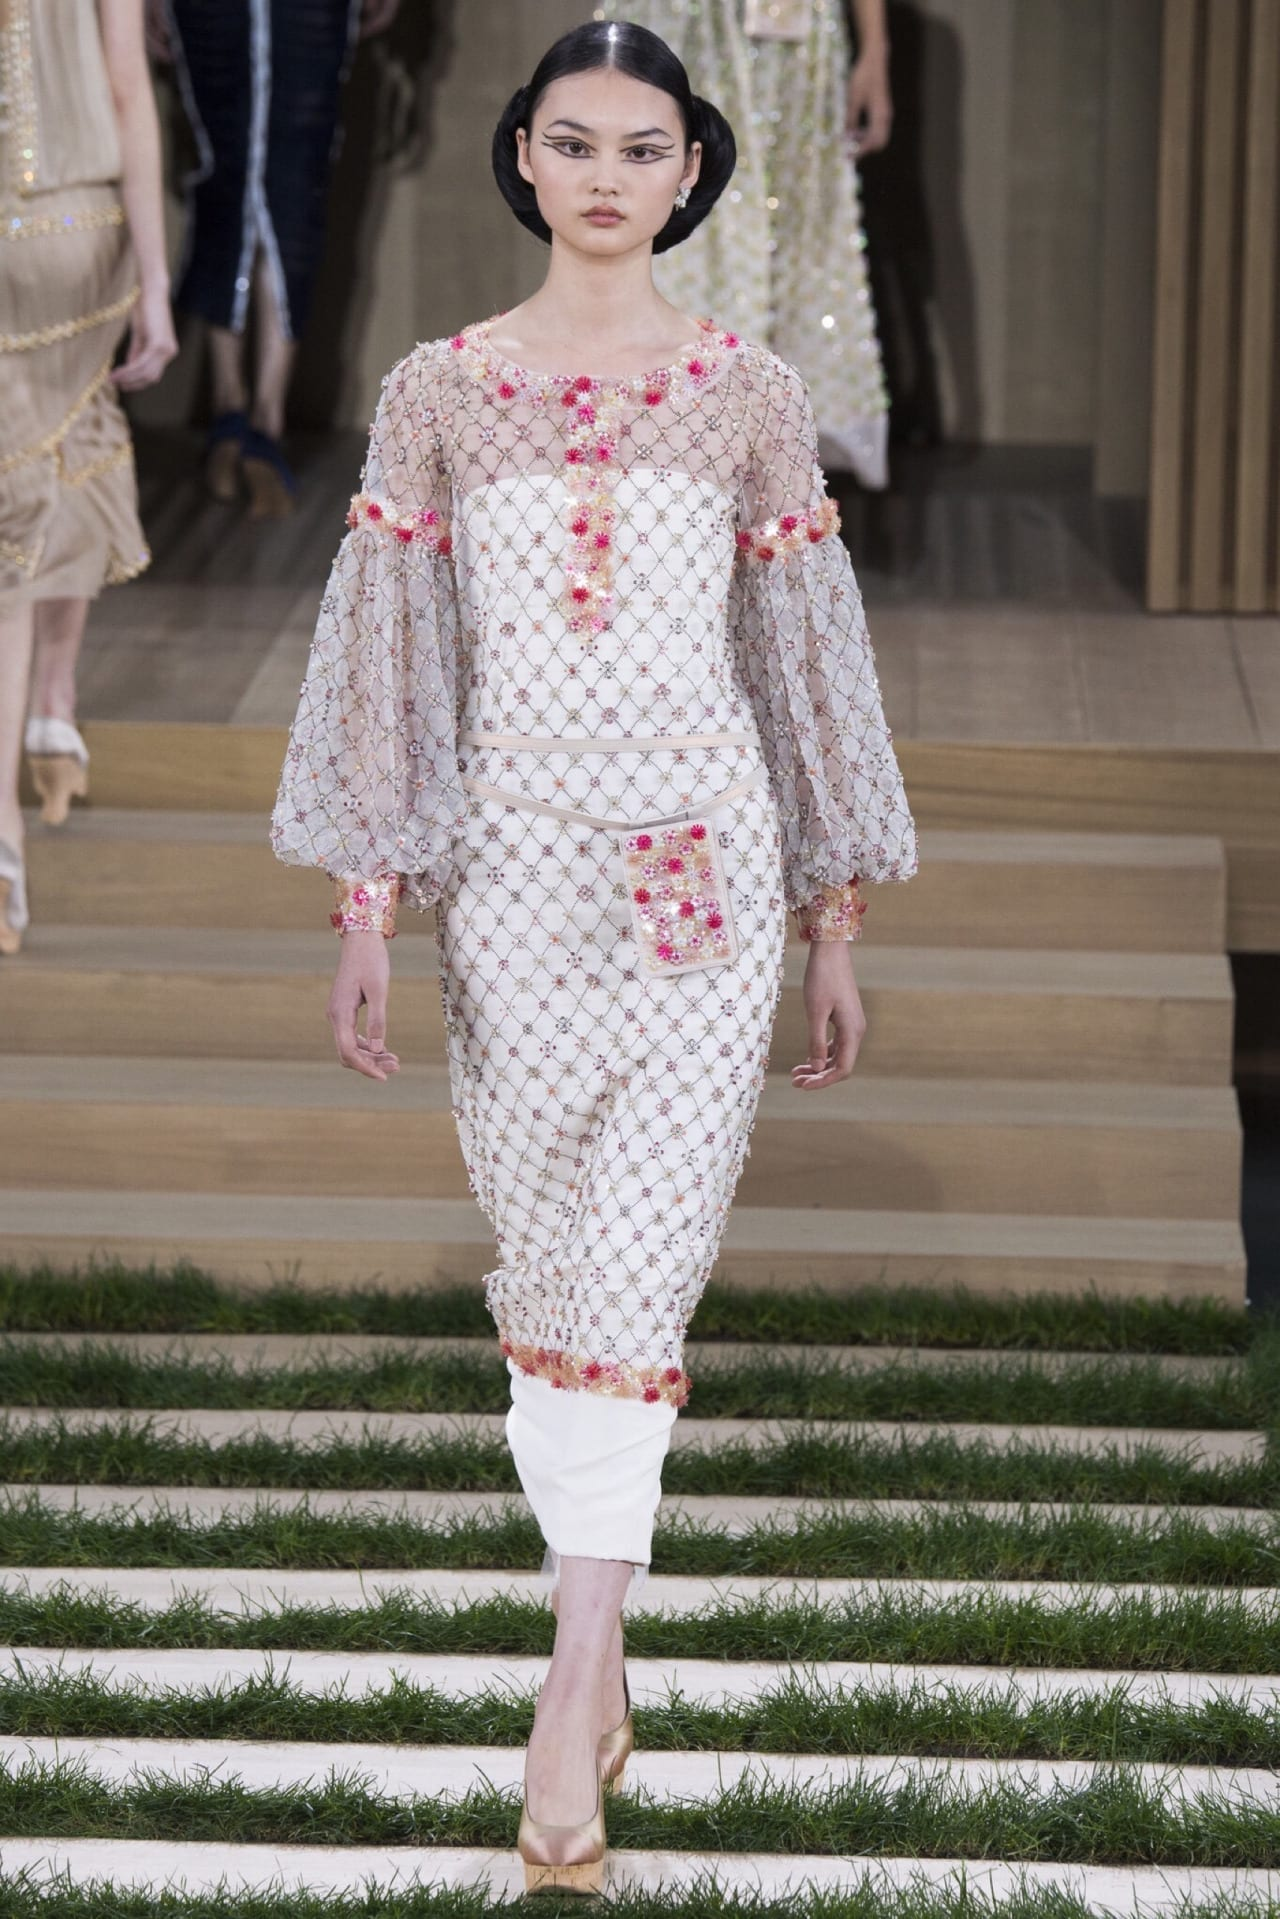 chanel haute couture primavera estate 2016, theladycracy.it, elisa bellino, fashion blog italia, fashion blogger italiane, chanel fashion show 2016